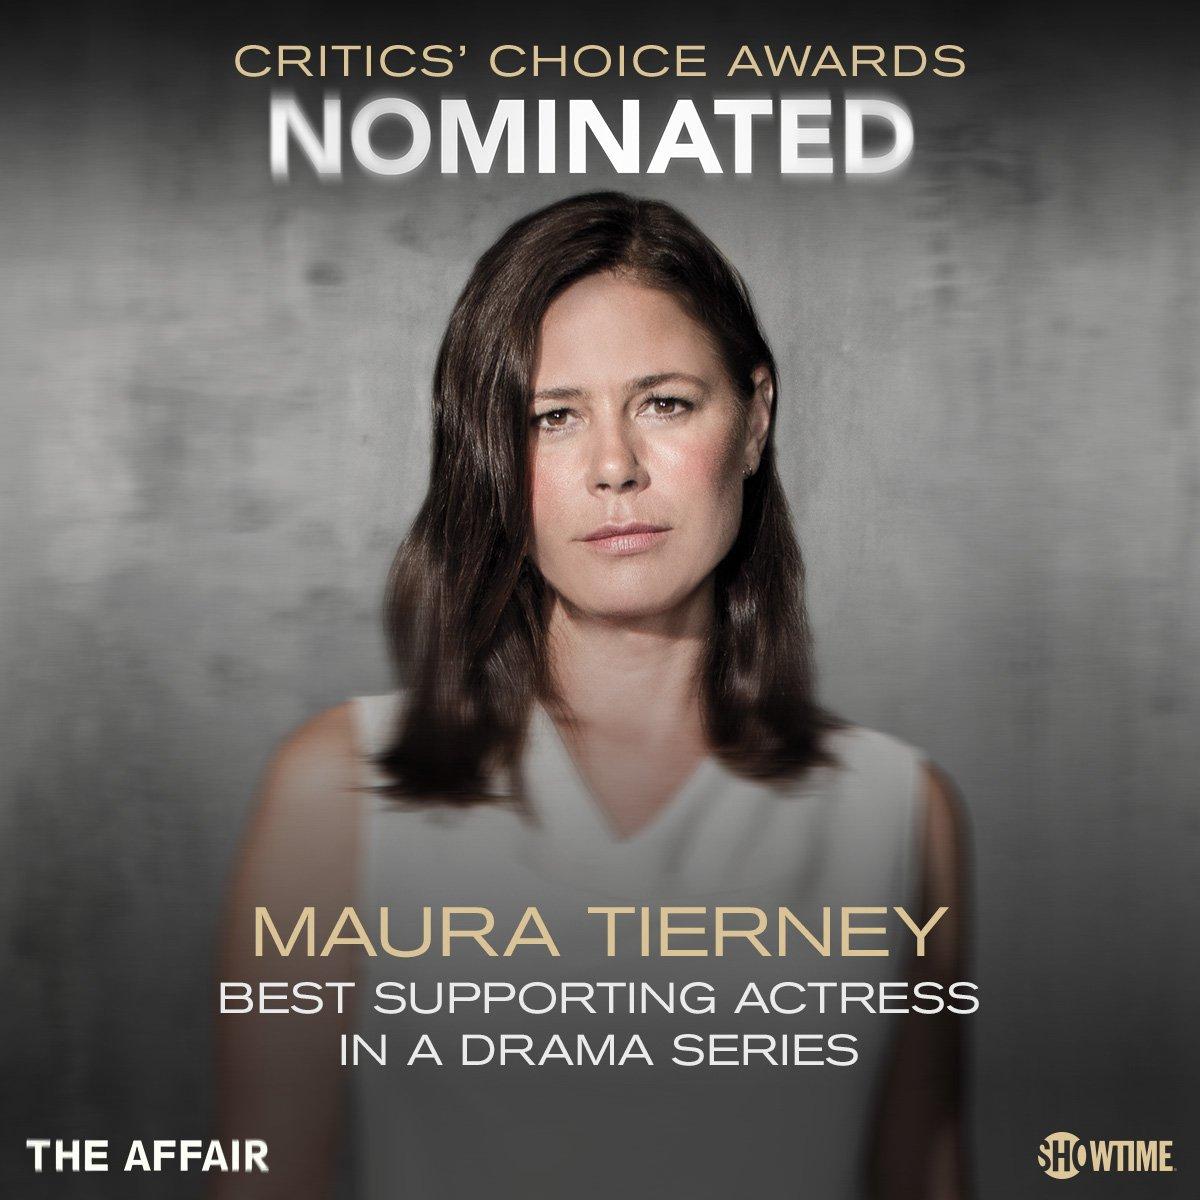 The Affair on ShowtimeVerified account